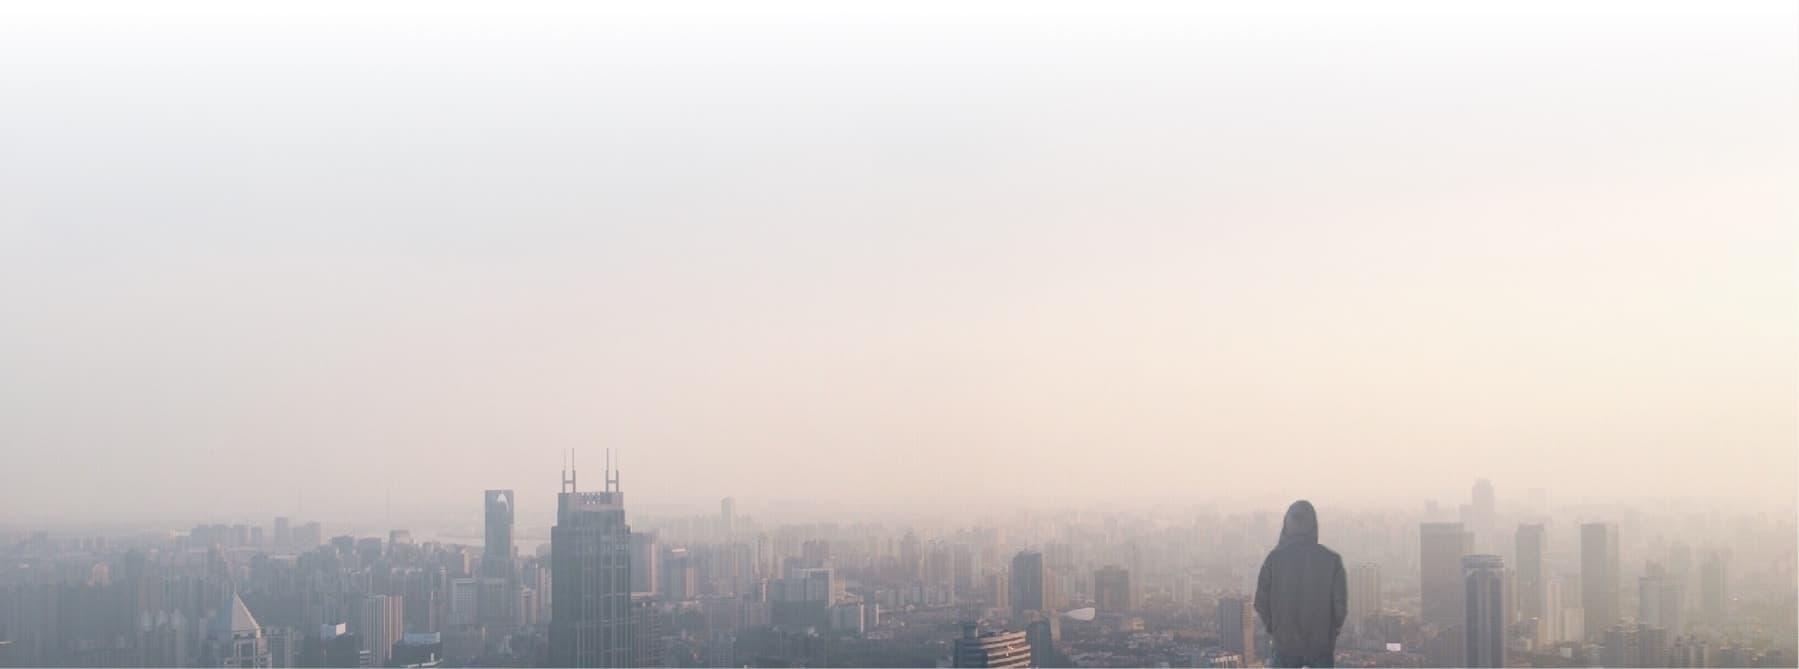 Man in hooded sweatshirt overlooking smoggy cityscape